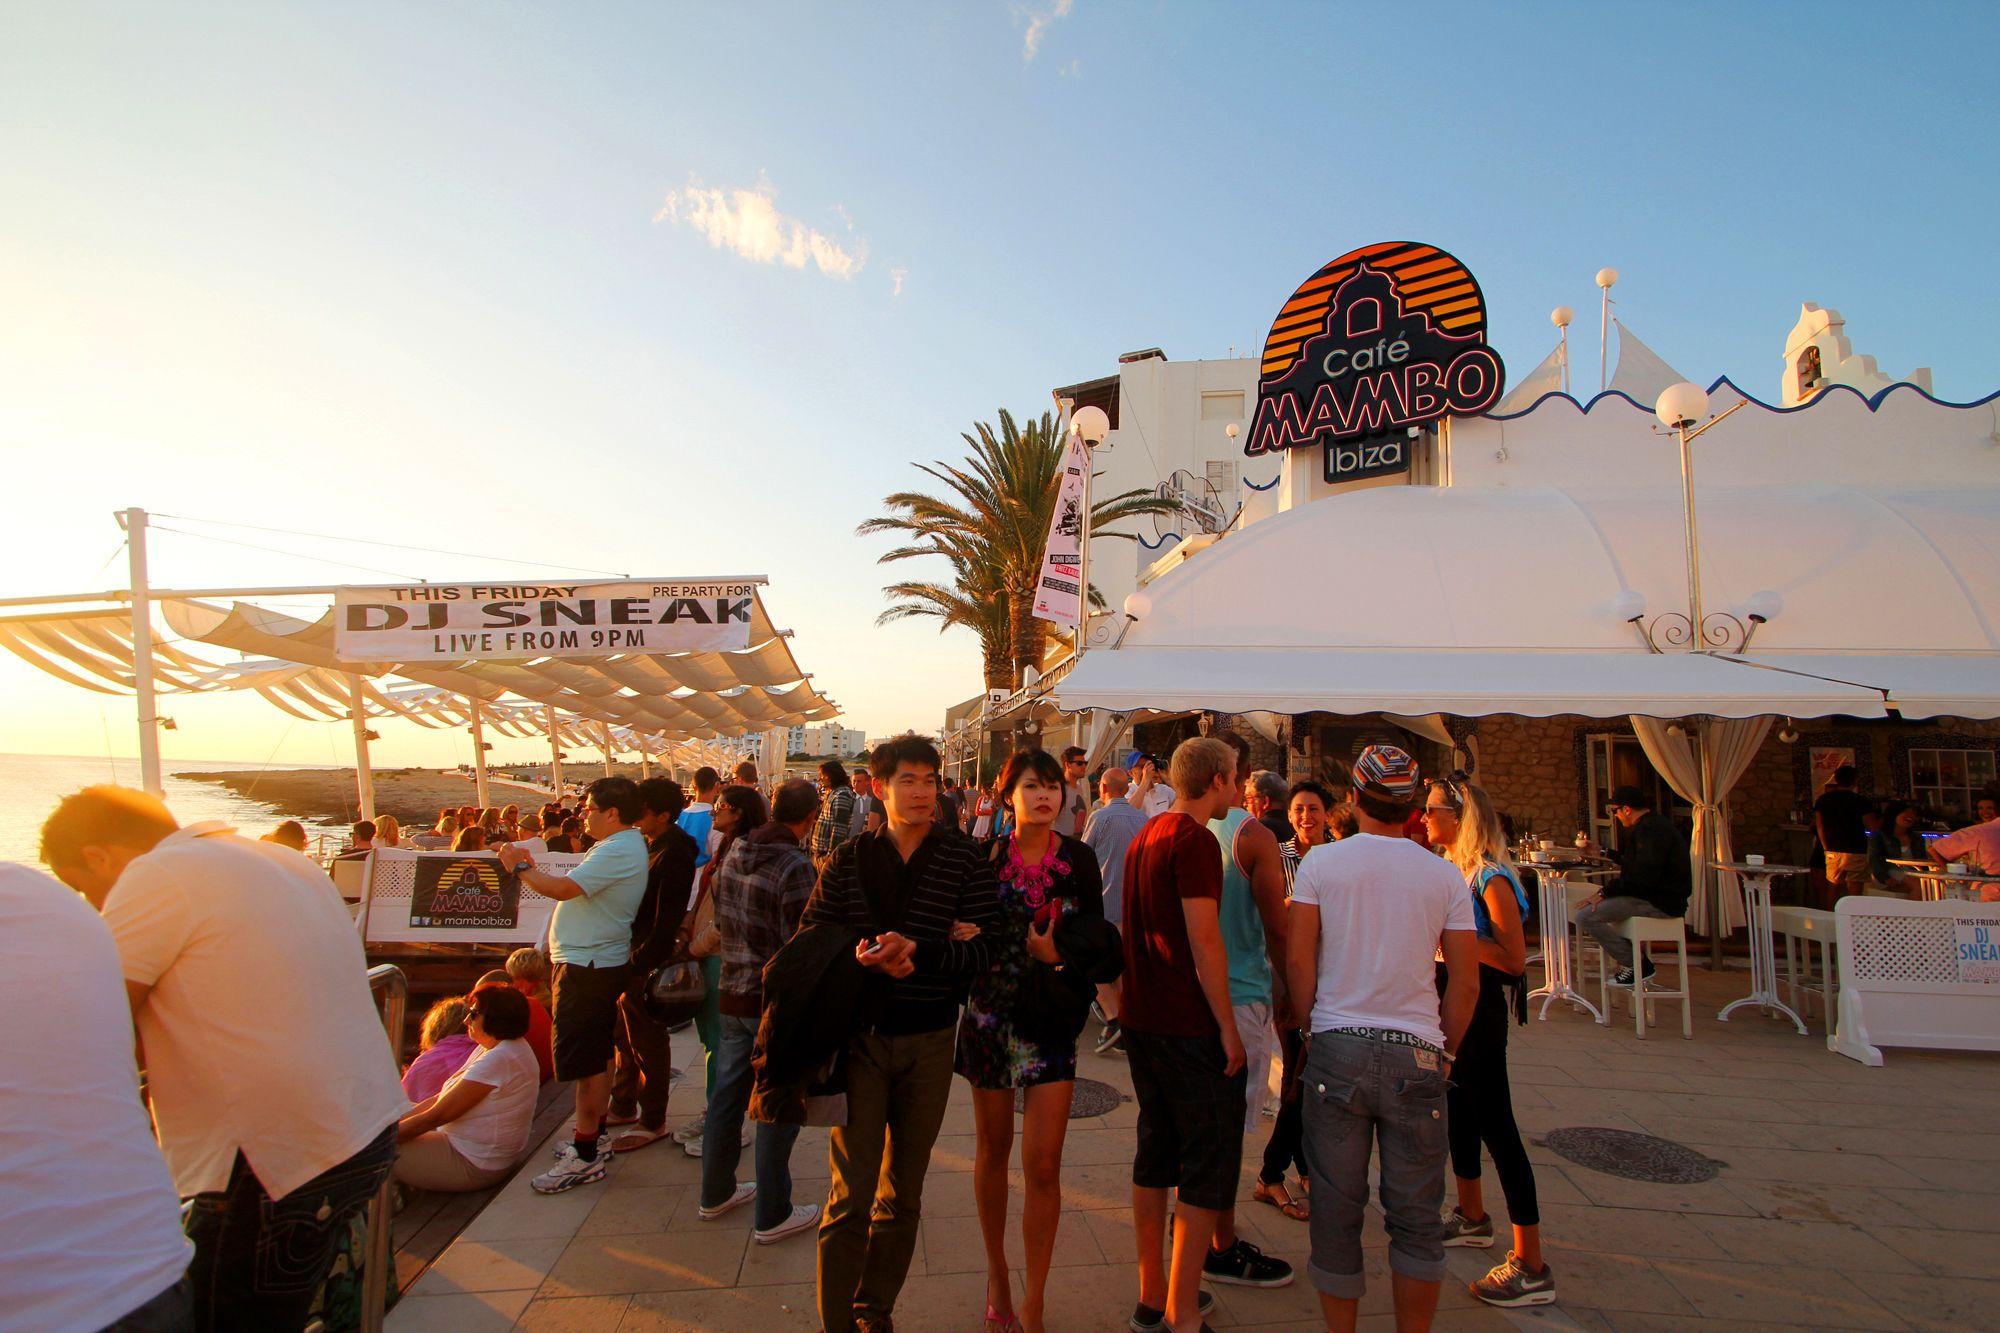 DJ Sneak at sunset #View #Places #Summer #Ibiza #Sun #2013 #Memories